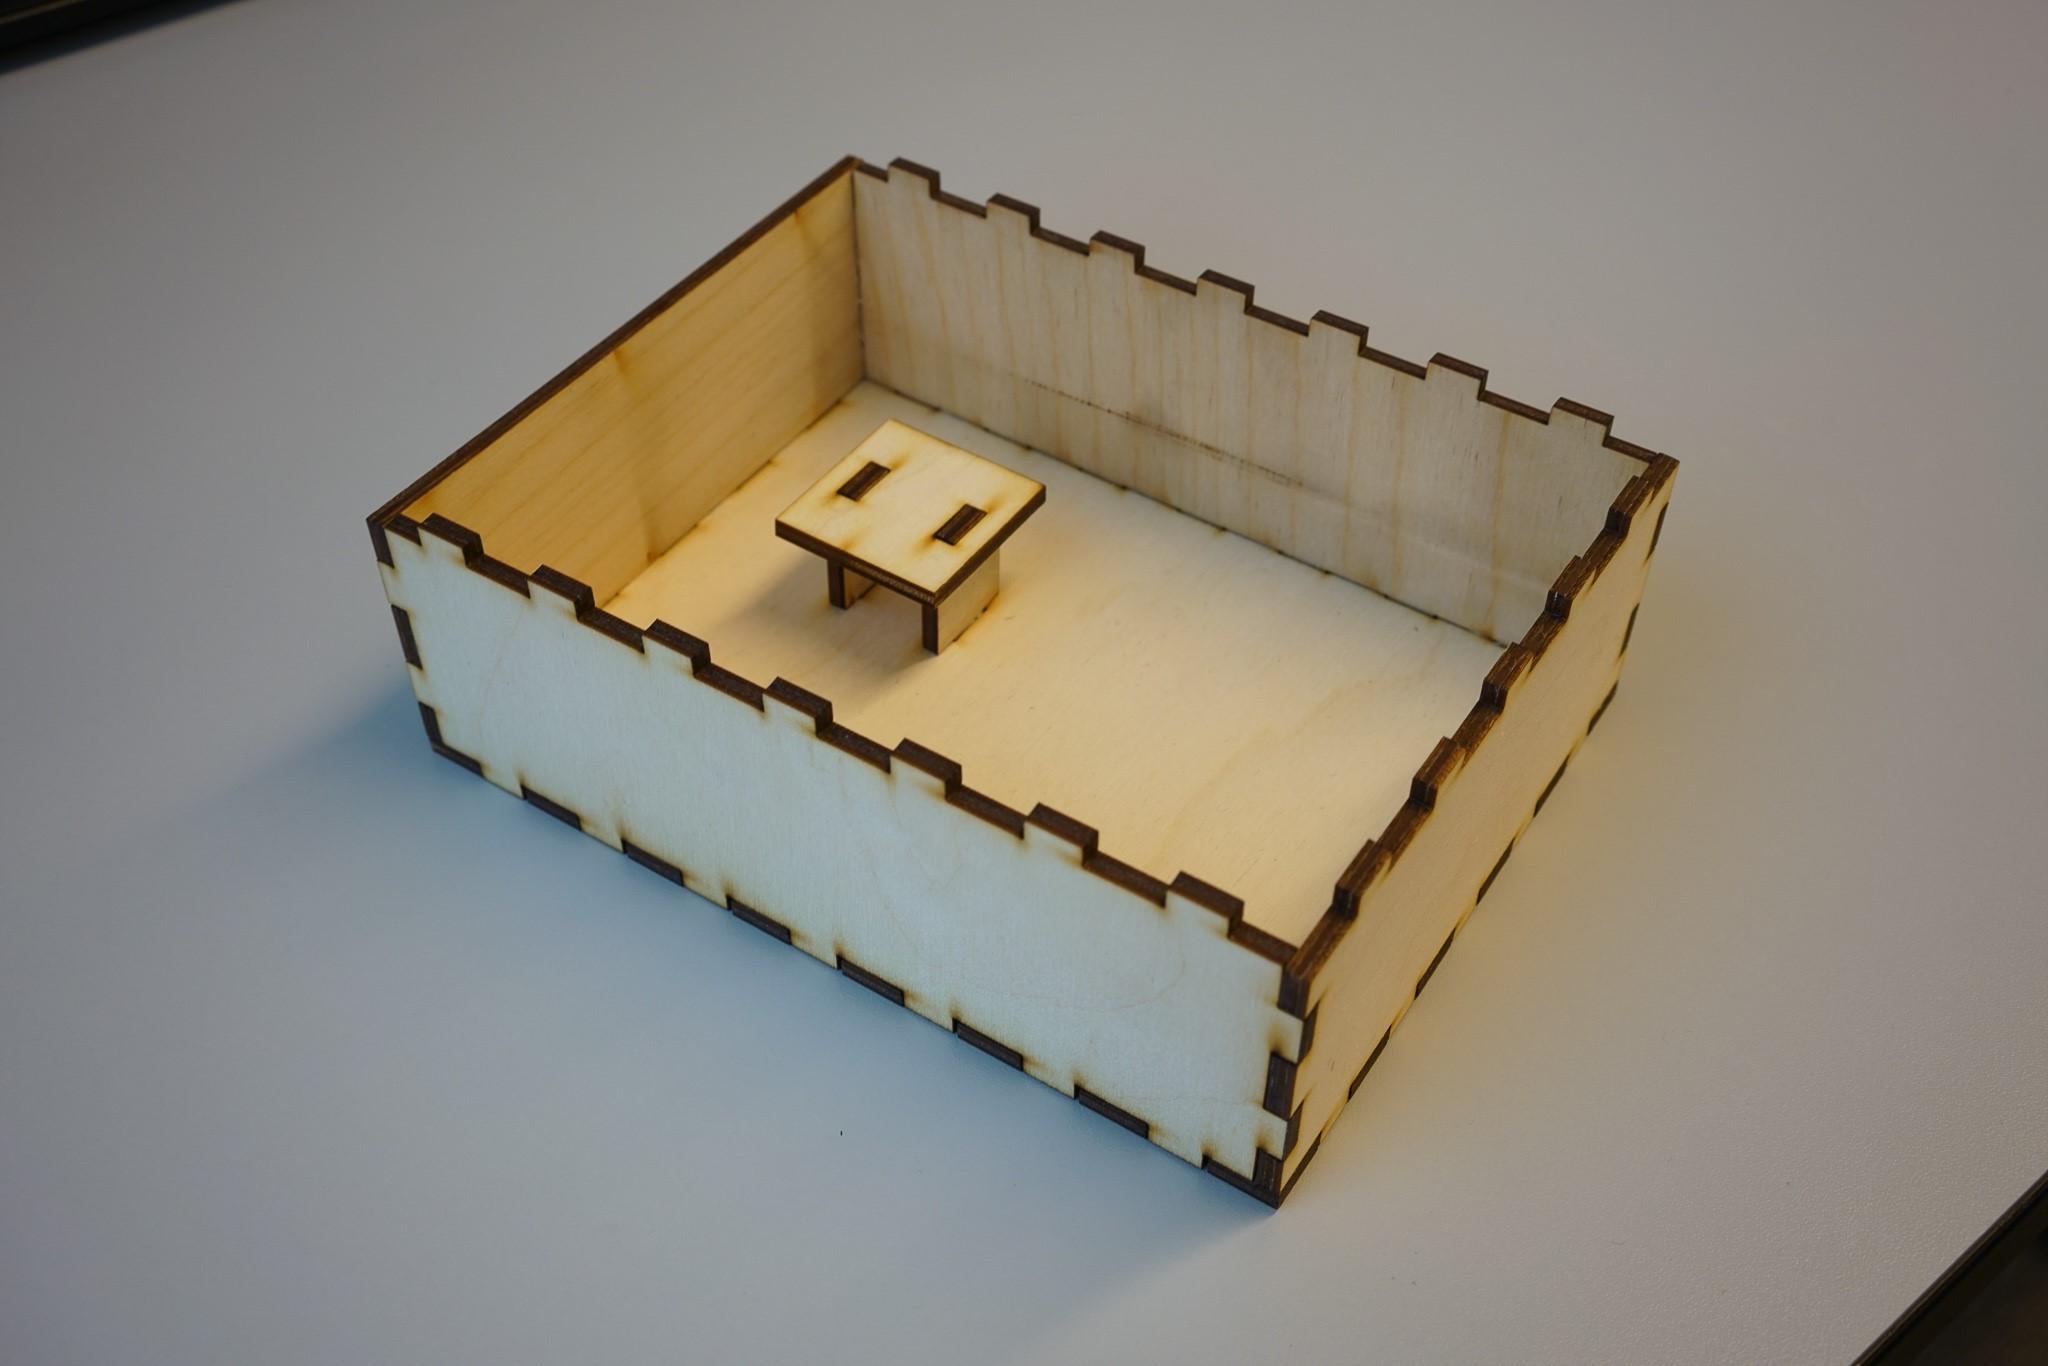 box_assembly_3.jpg